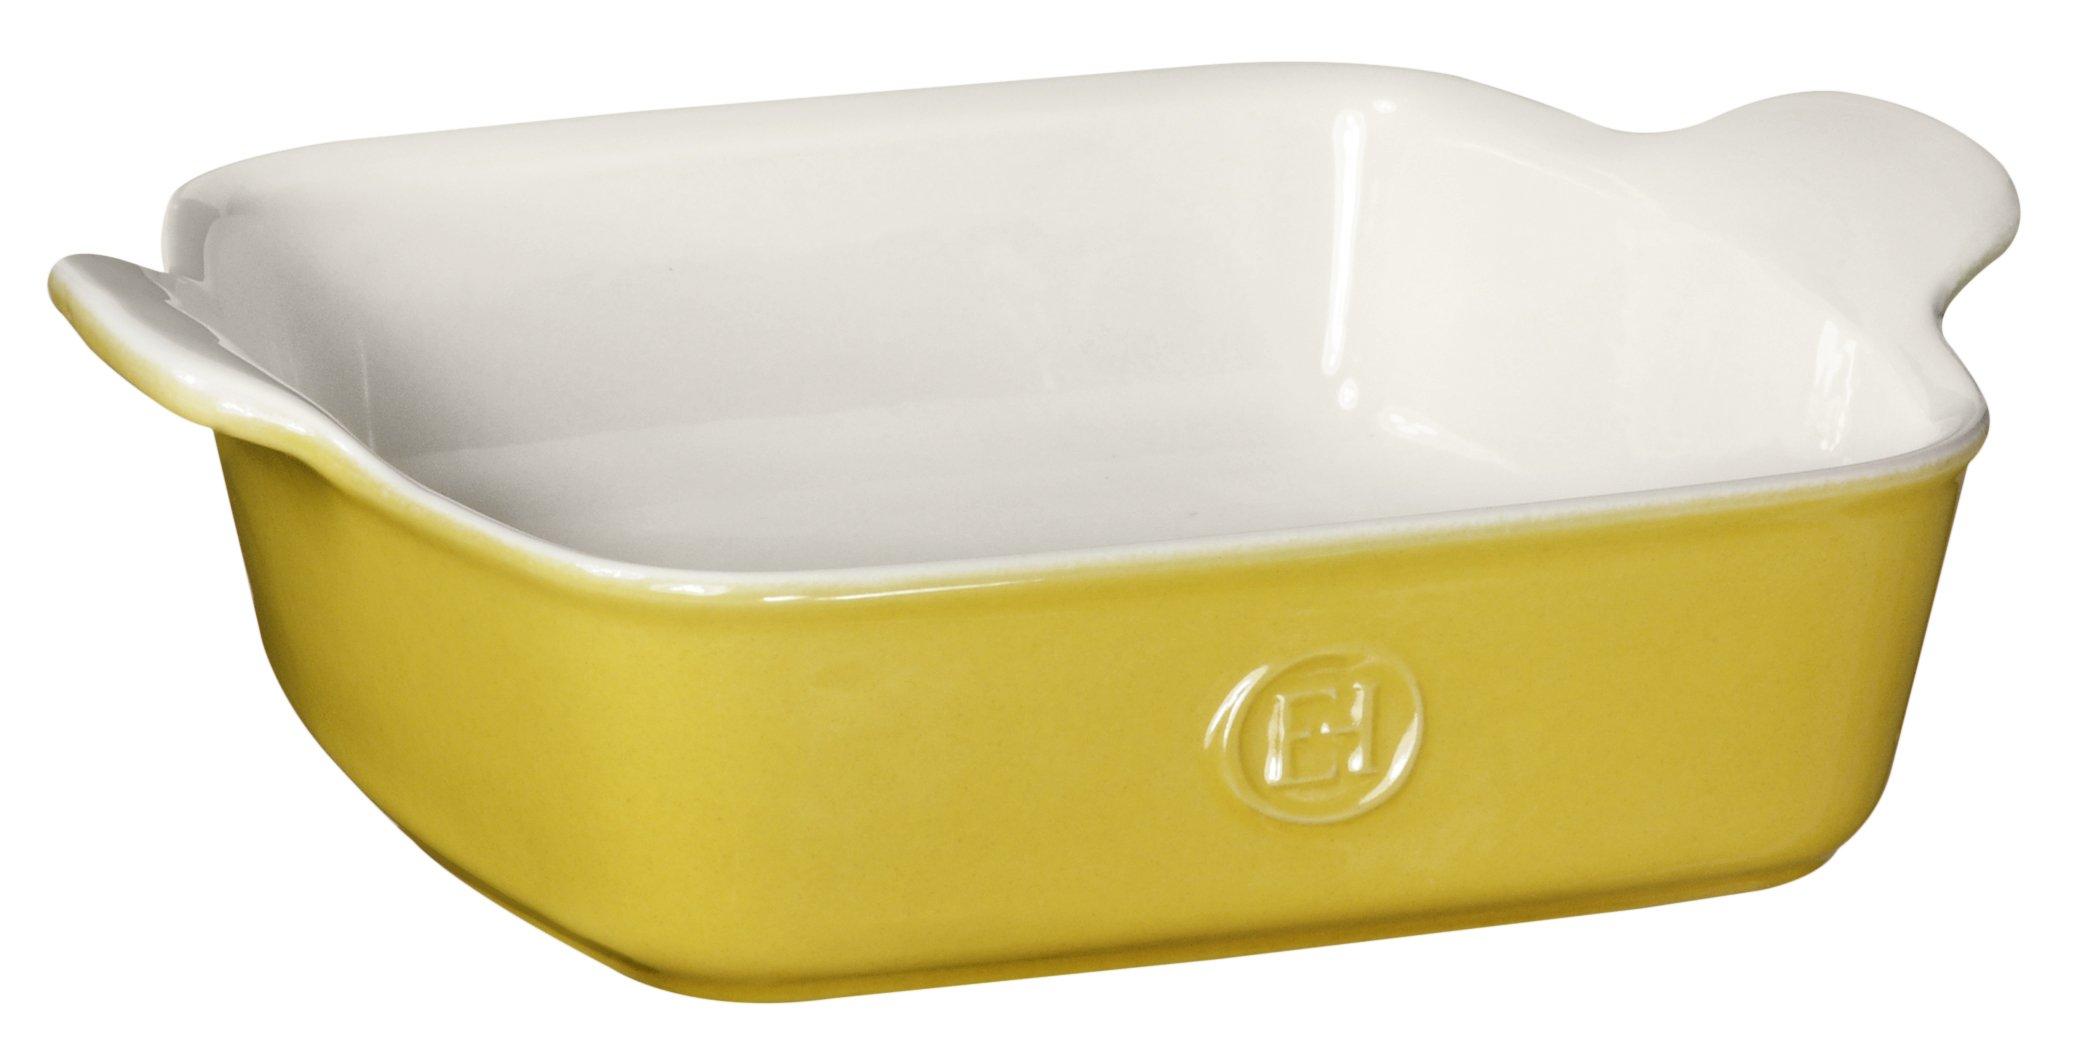 Emile Henry HR Modern Classics Square Baking Dish 8 x 8'' / 2 Qt, Yellow